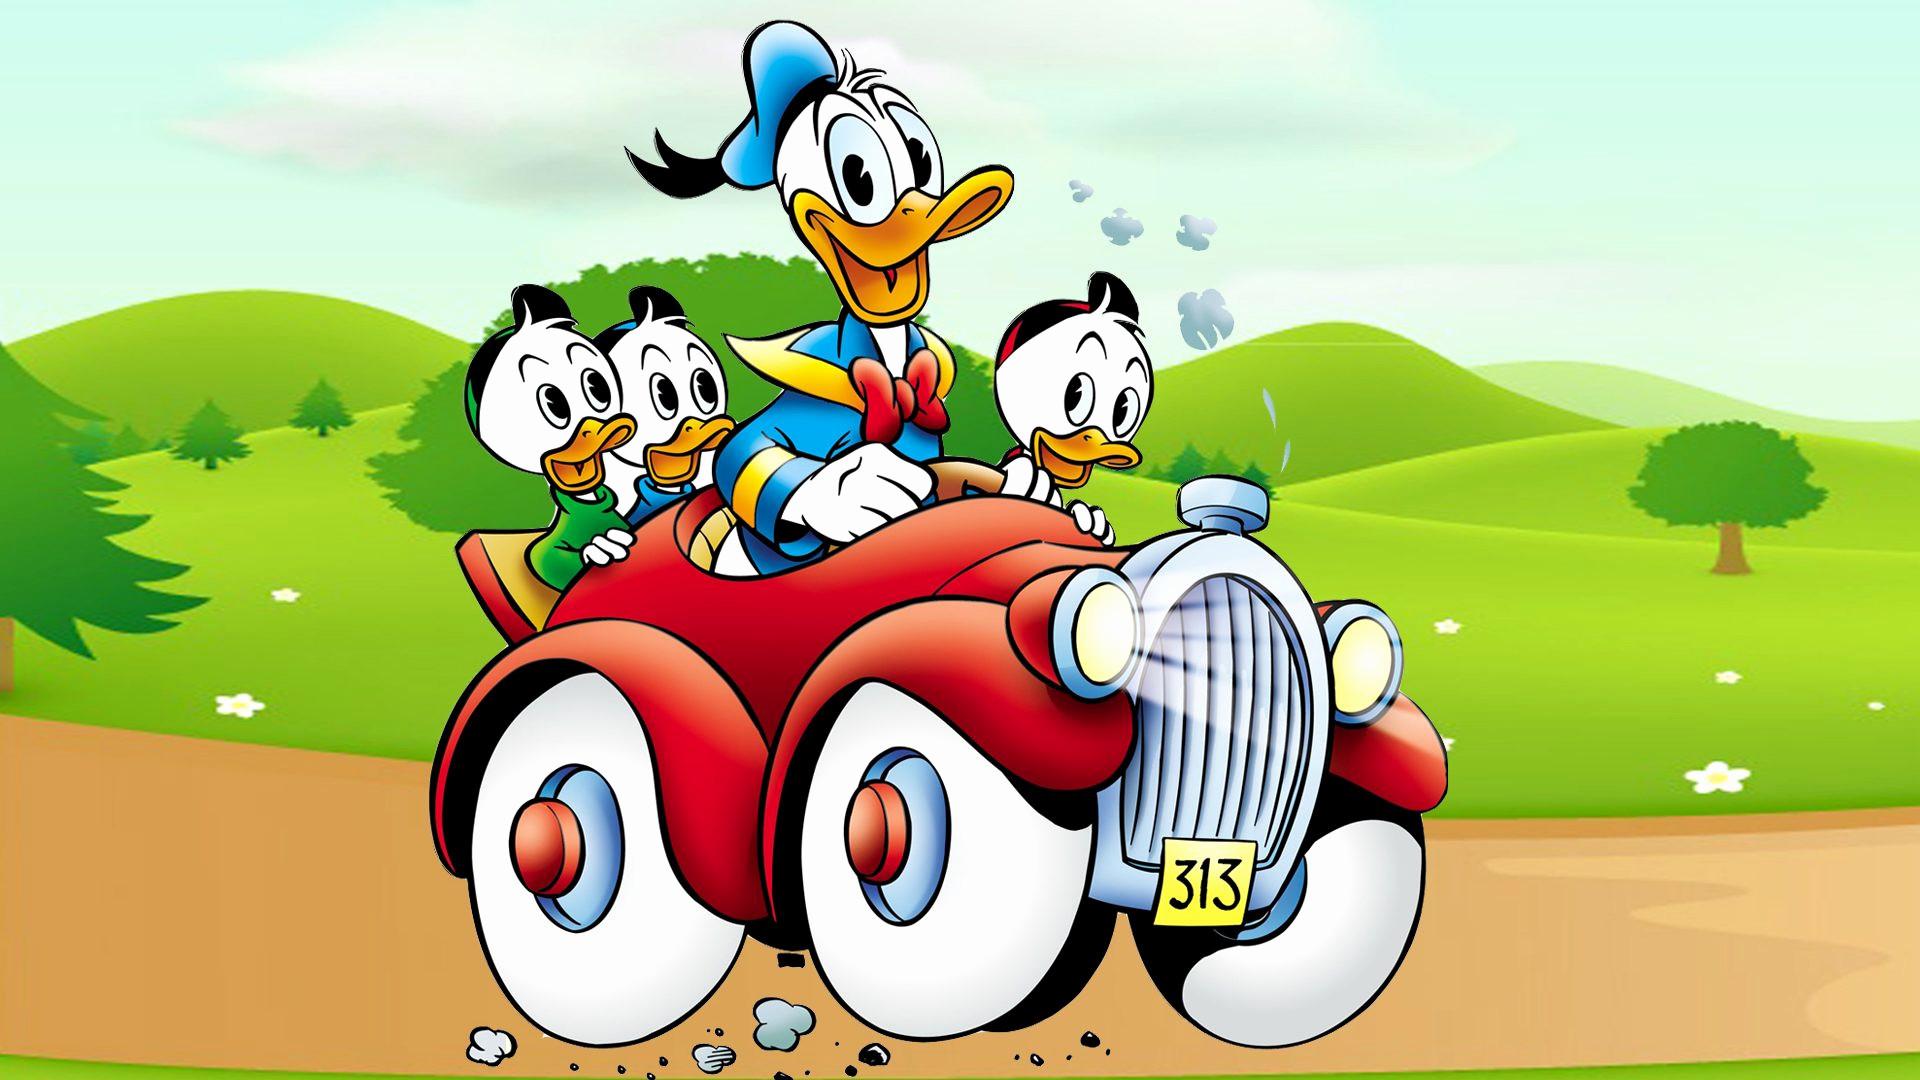 Wallpaper cars cartoon 62 images - Donald duck wallpapers for desktop ...